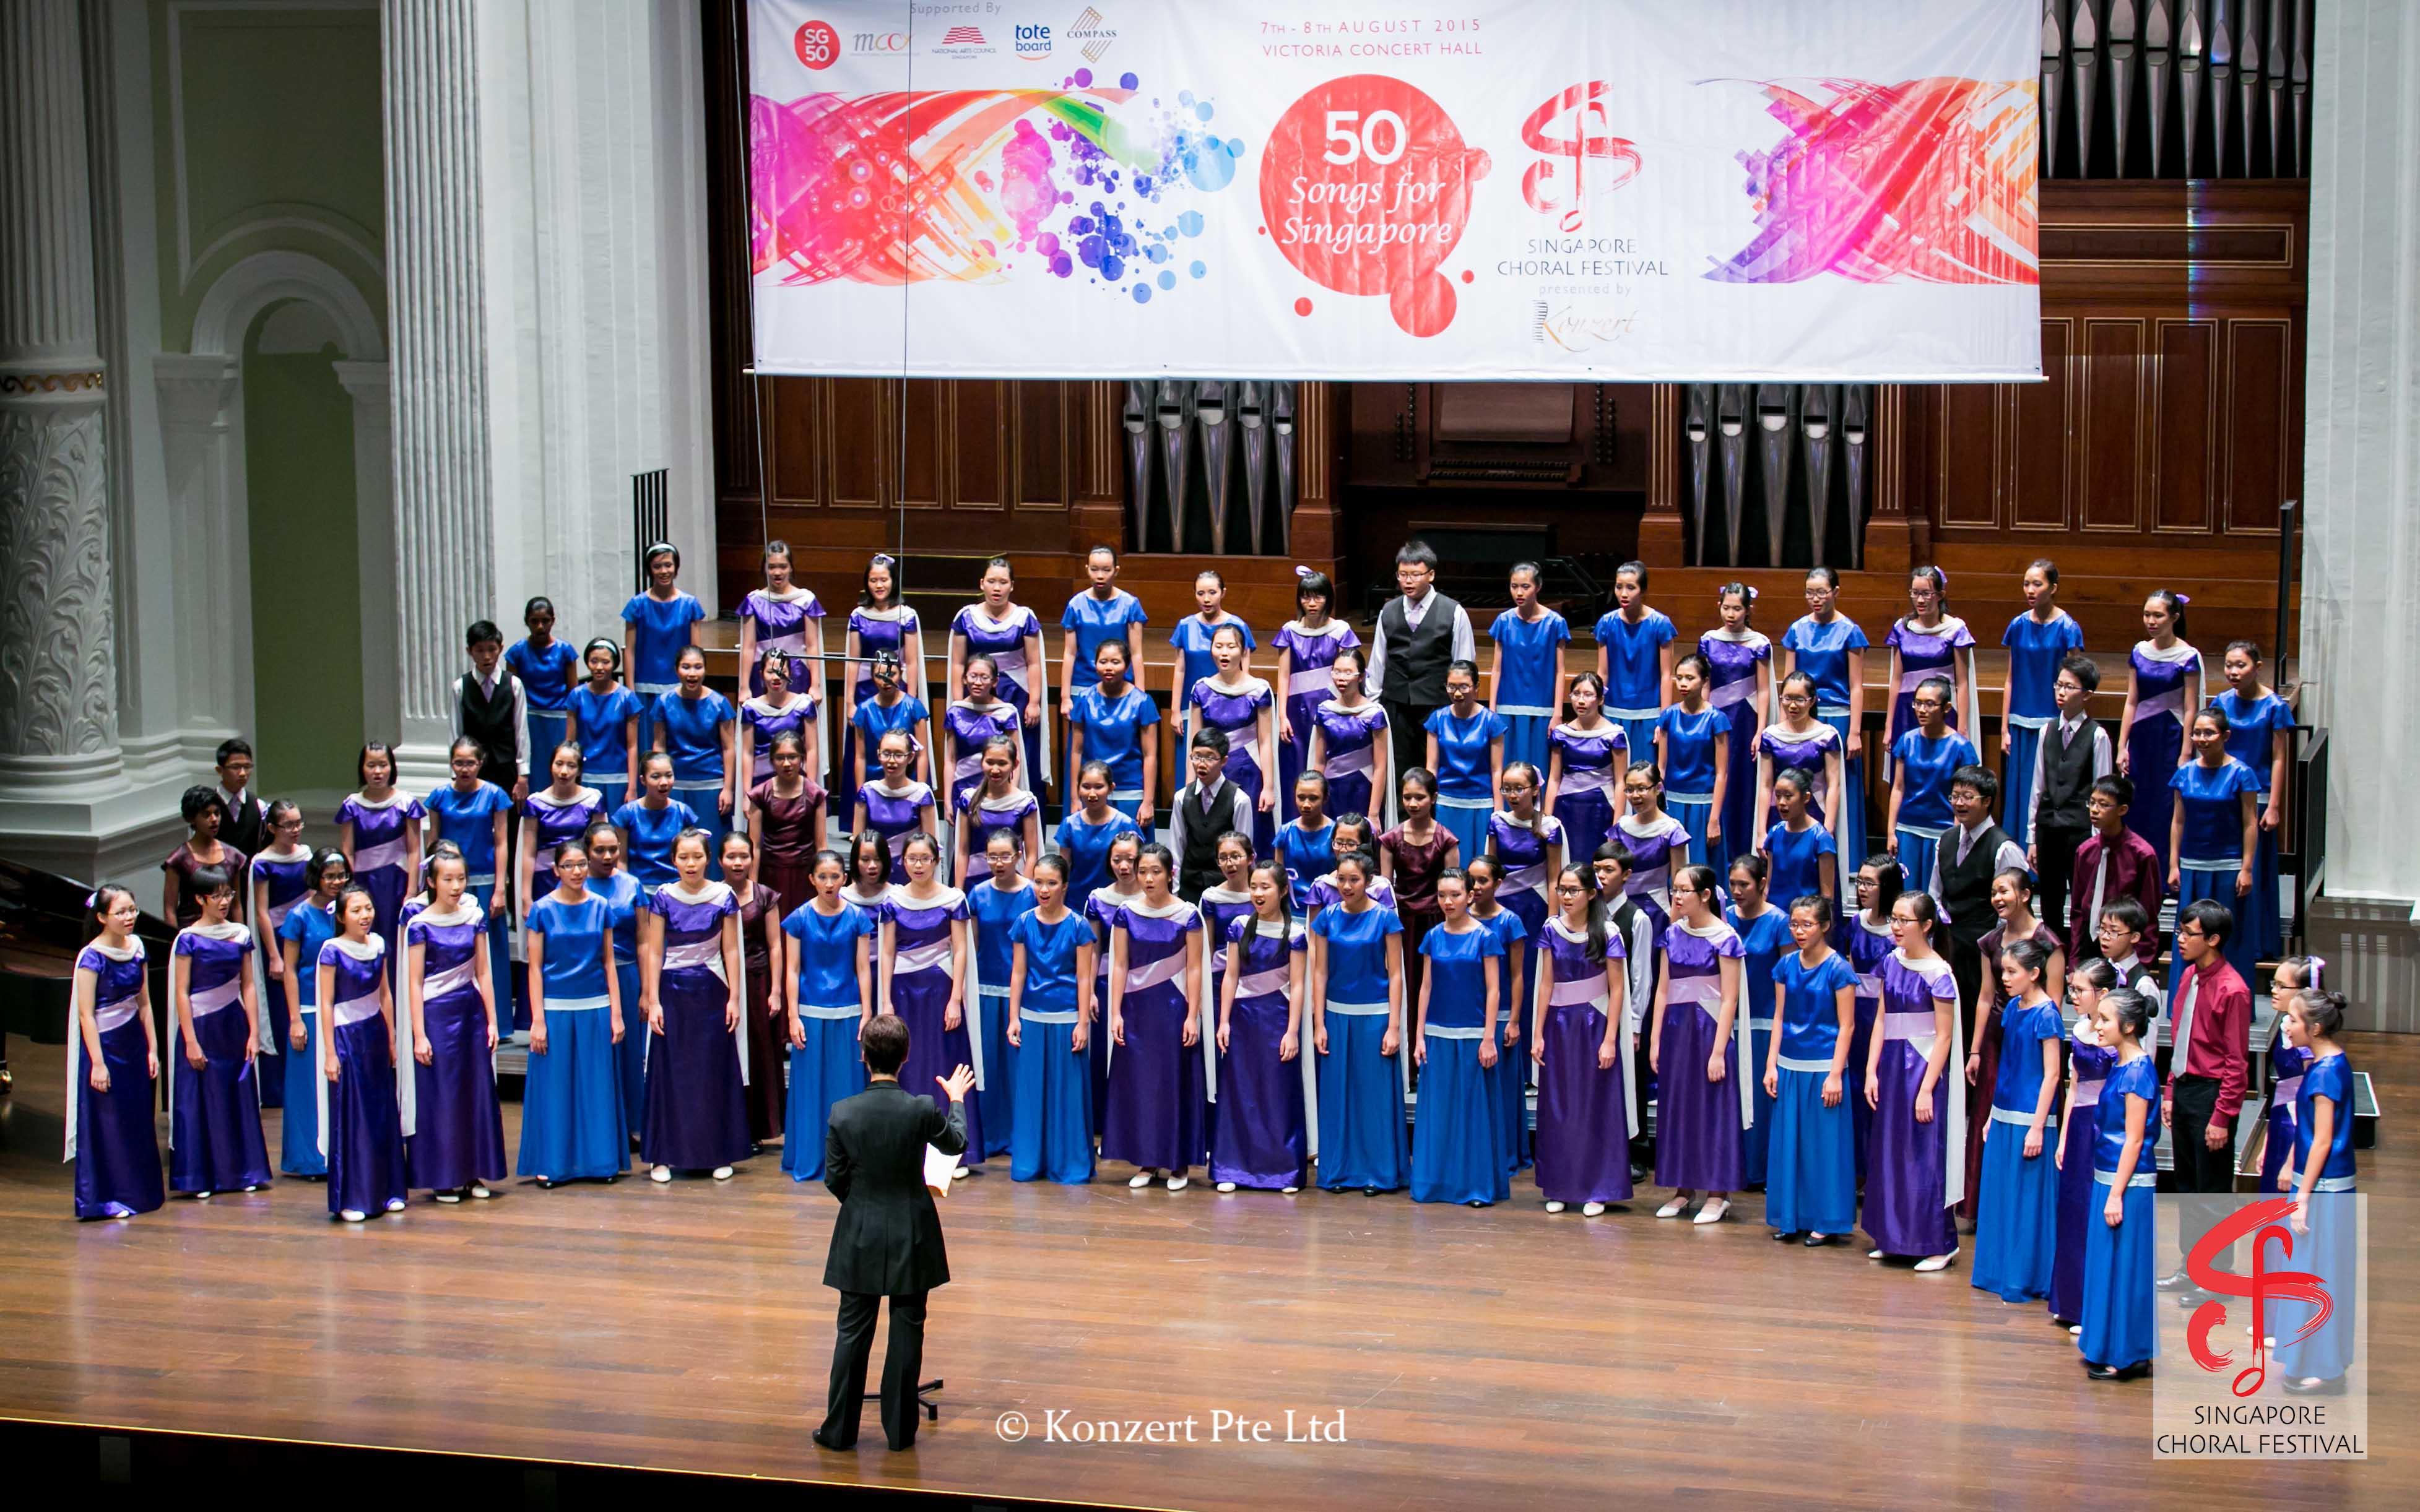 Singapore Choral Festival 7-8-15 (285).jpg